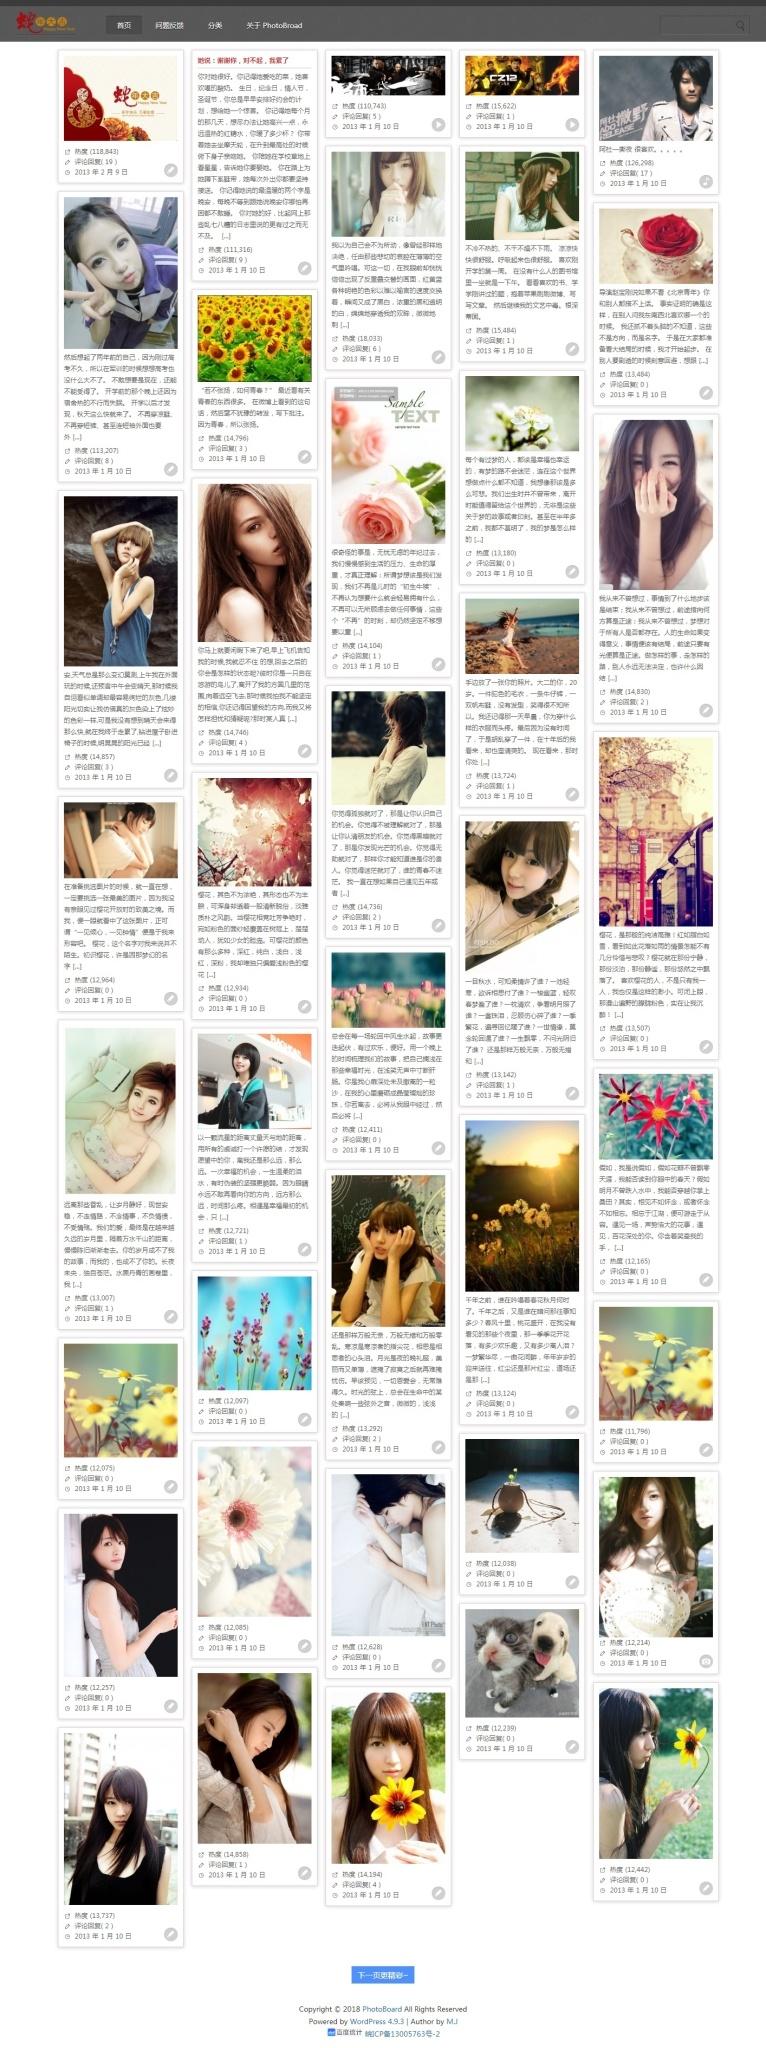 wordpress瀑布流圖片主題PhotoBroad模板2.0